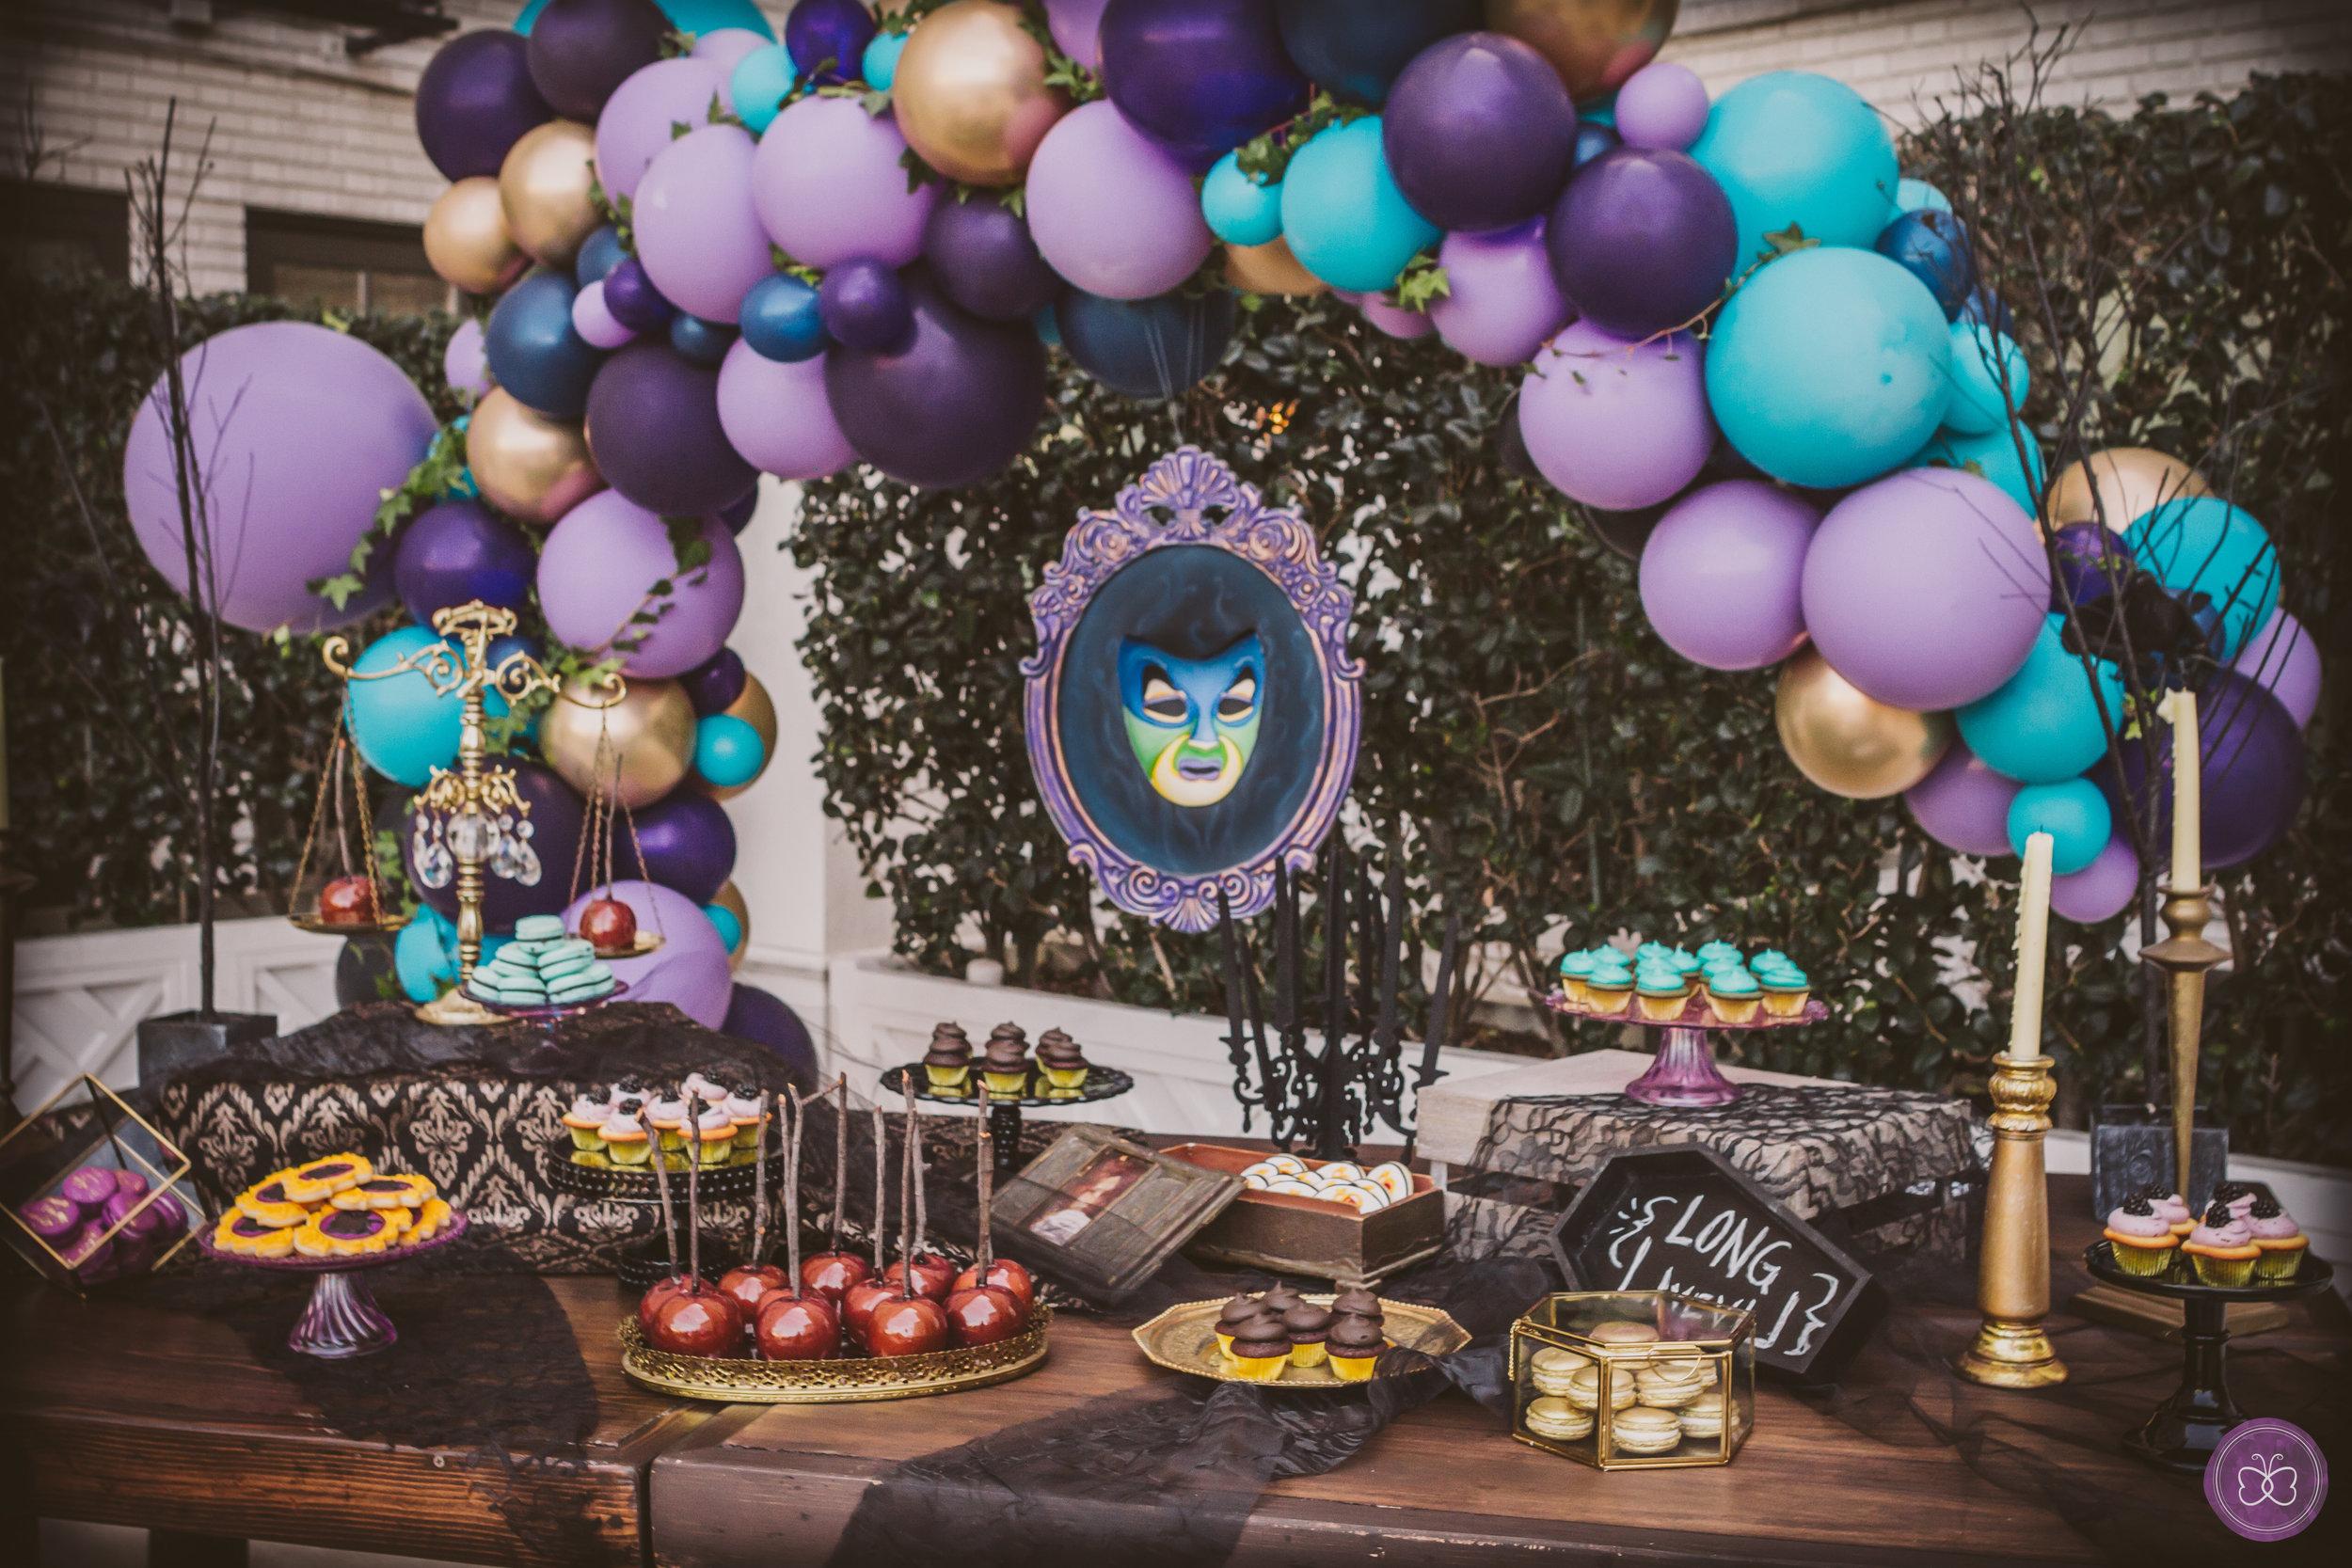 Beverly Wilshire Hotel Descendants Party 2018-7220.jpg